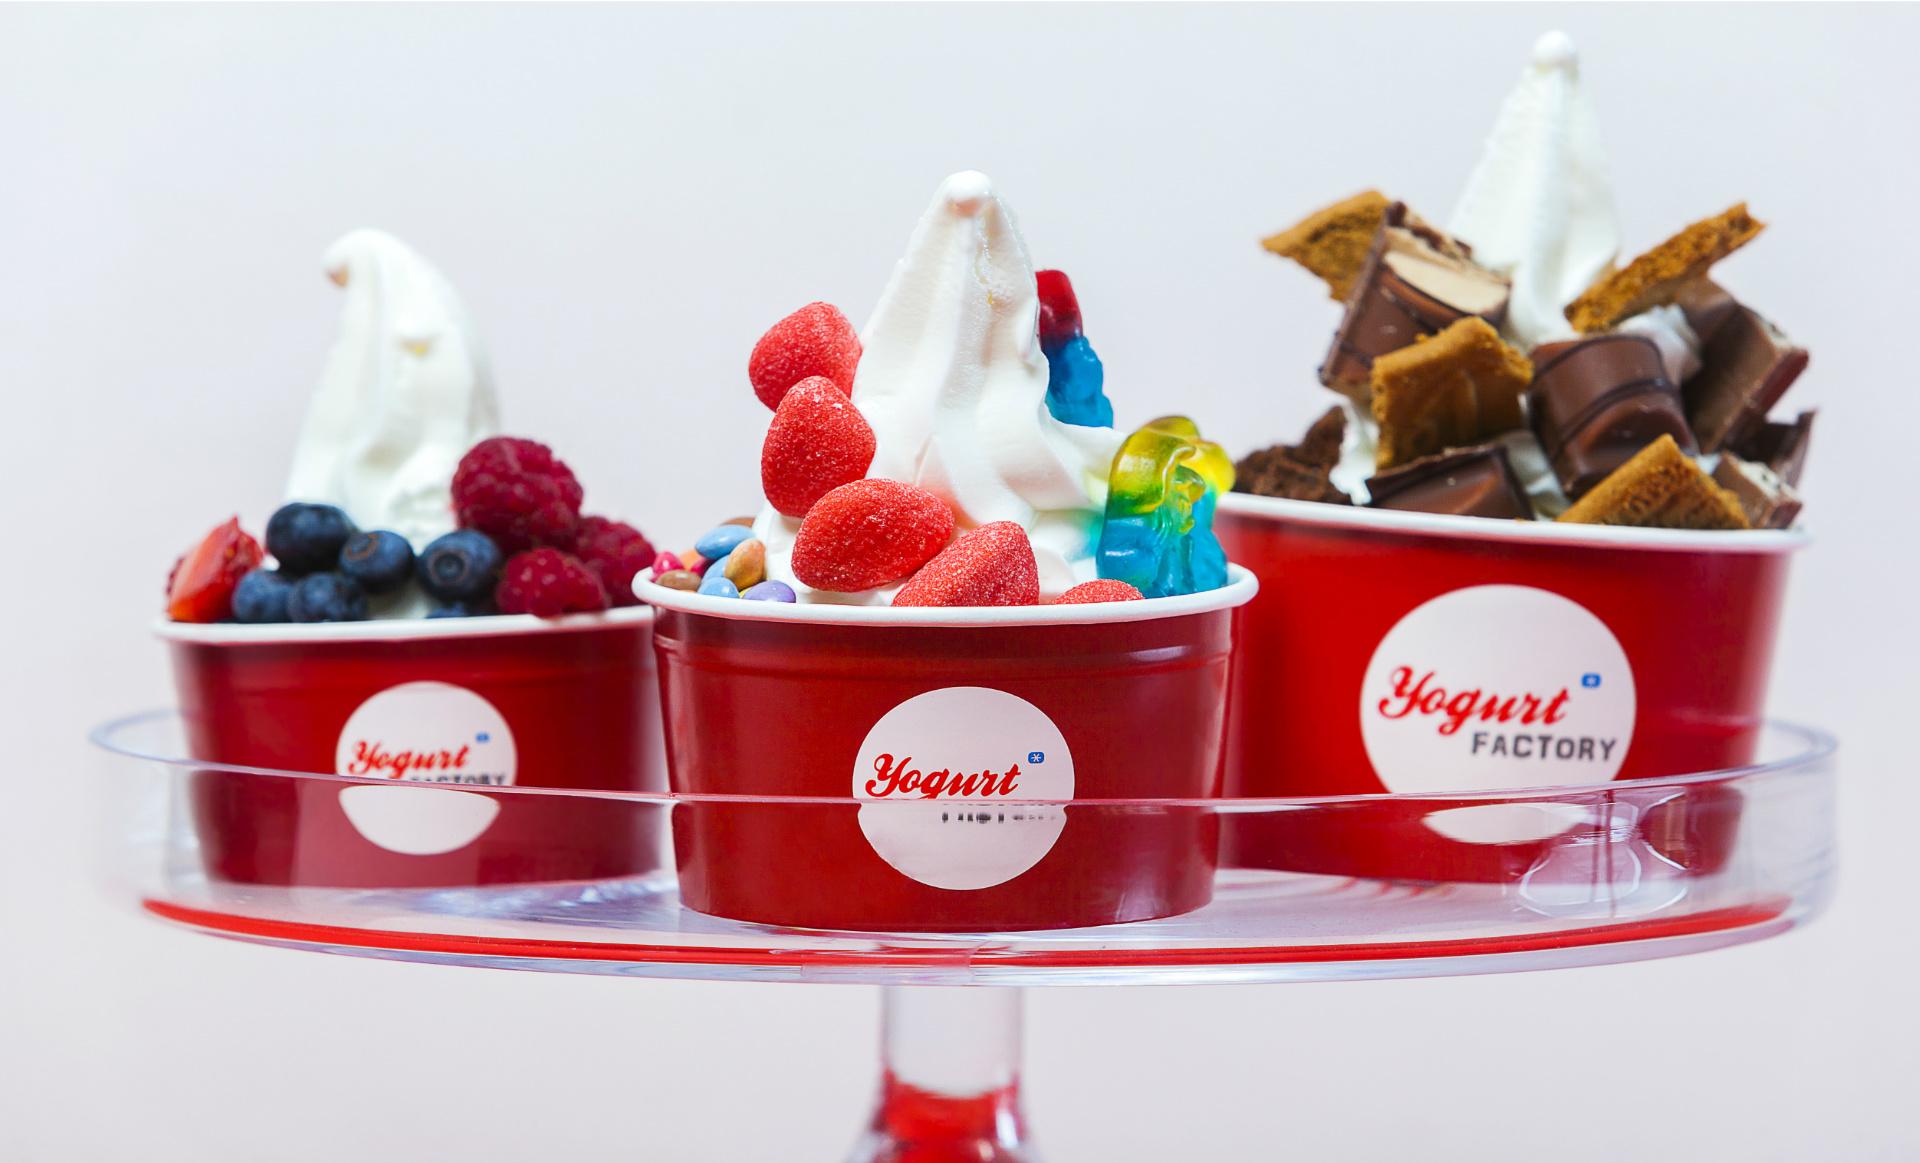 Yogurt Factory (Colombia - Rennes)